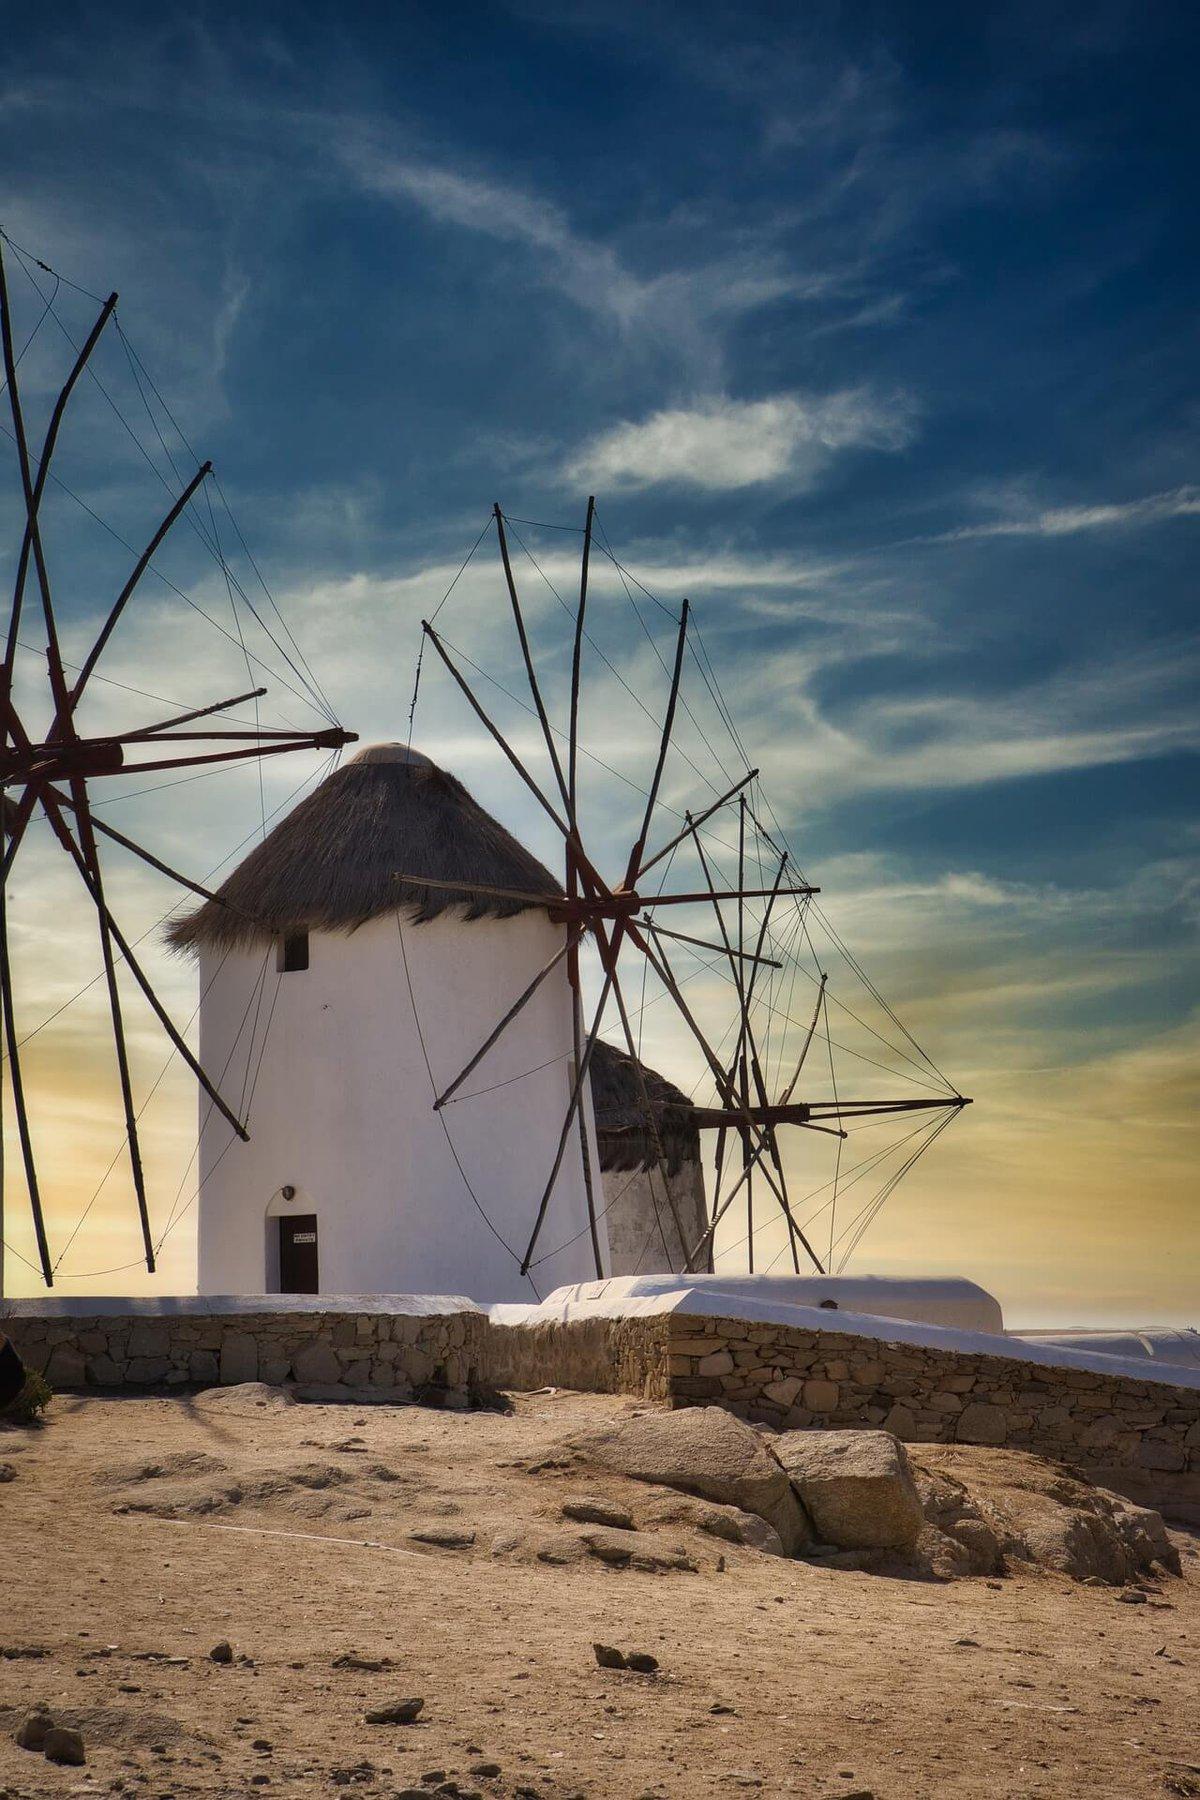 mykonos-windmills-4989213_1920-pixabay.jpg